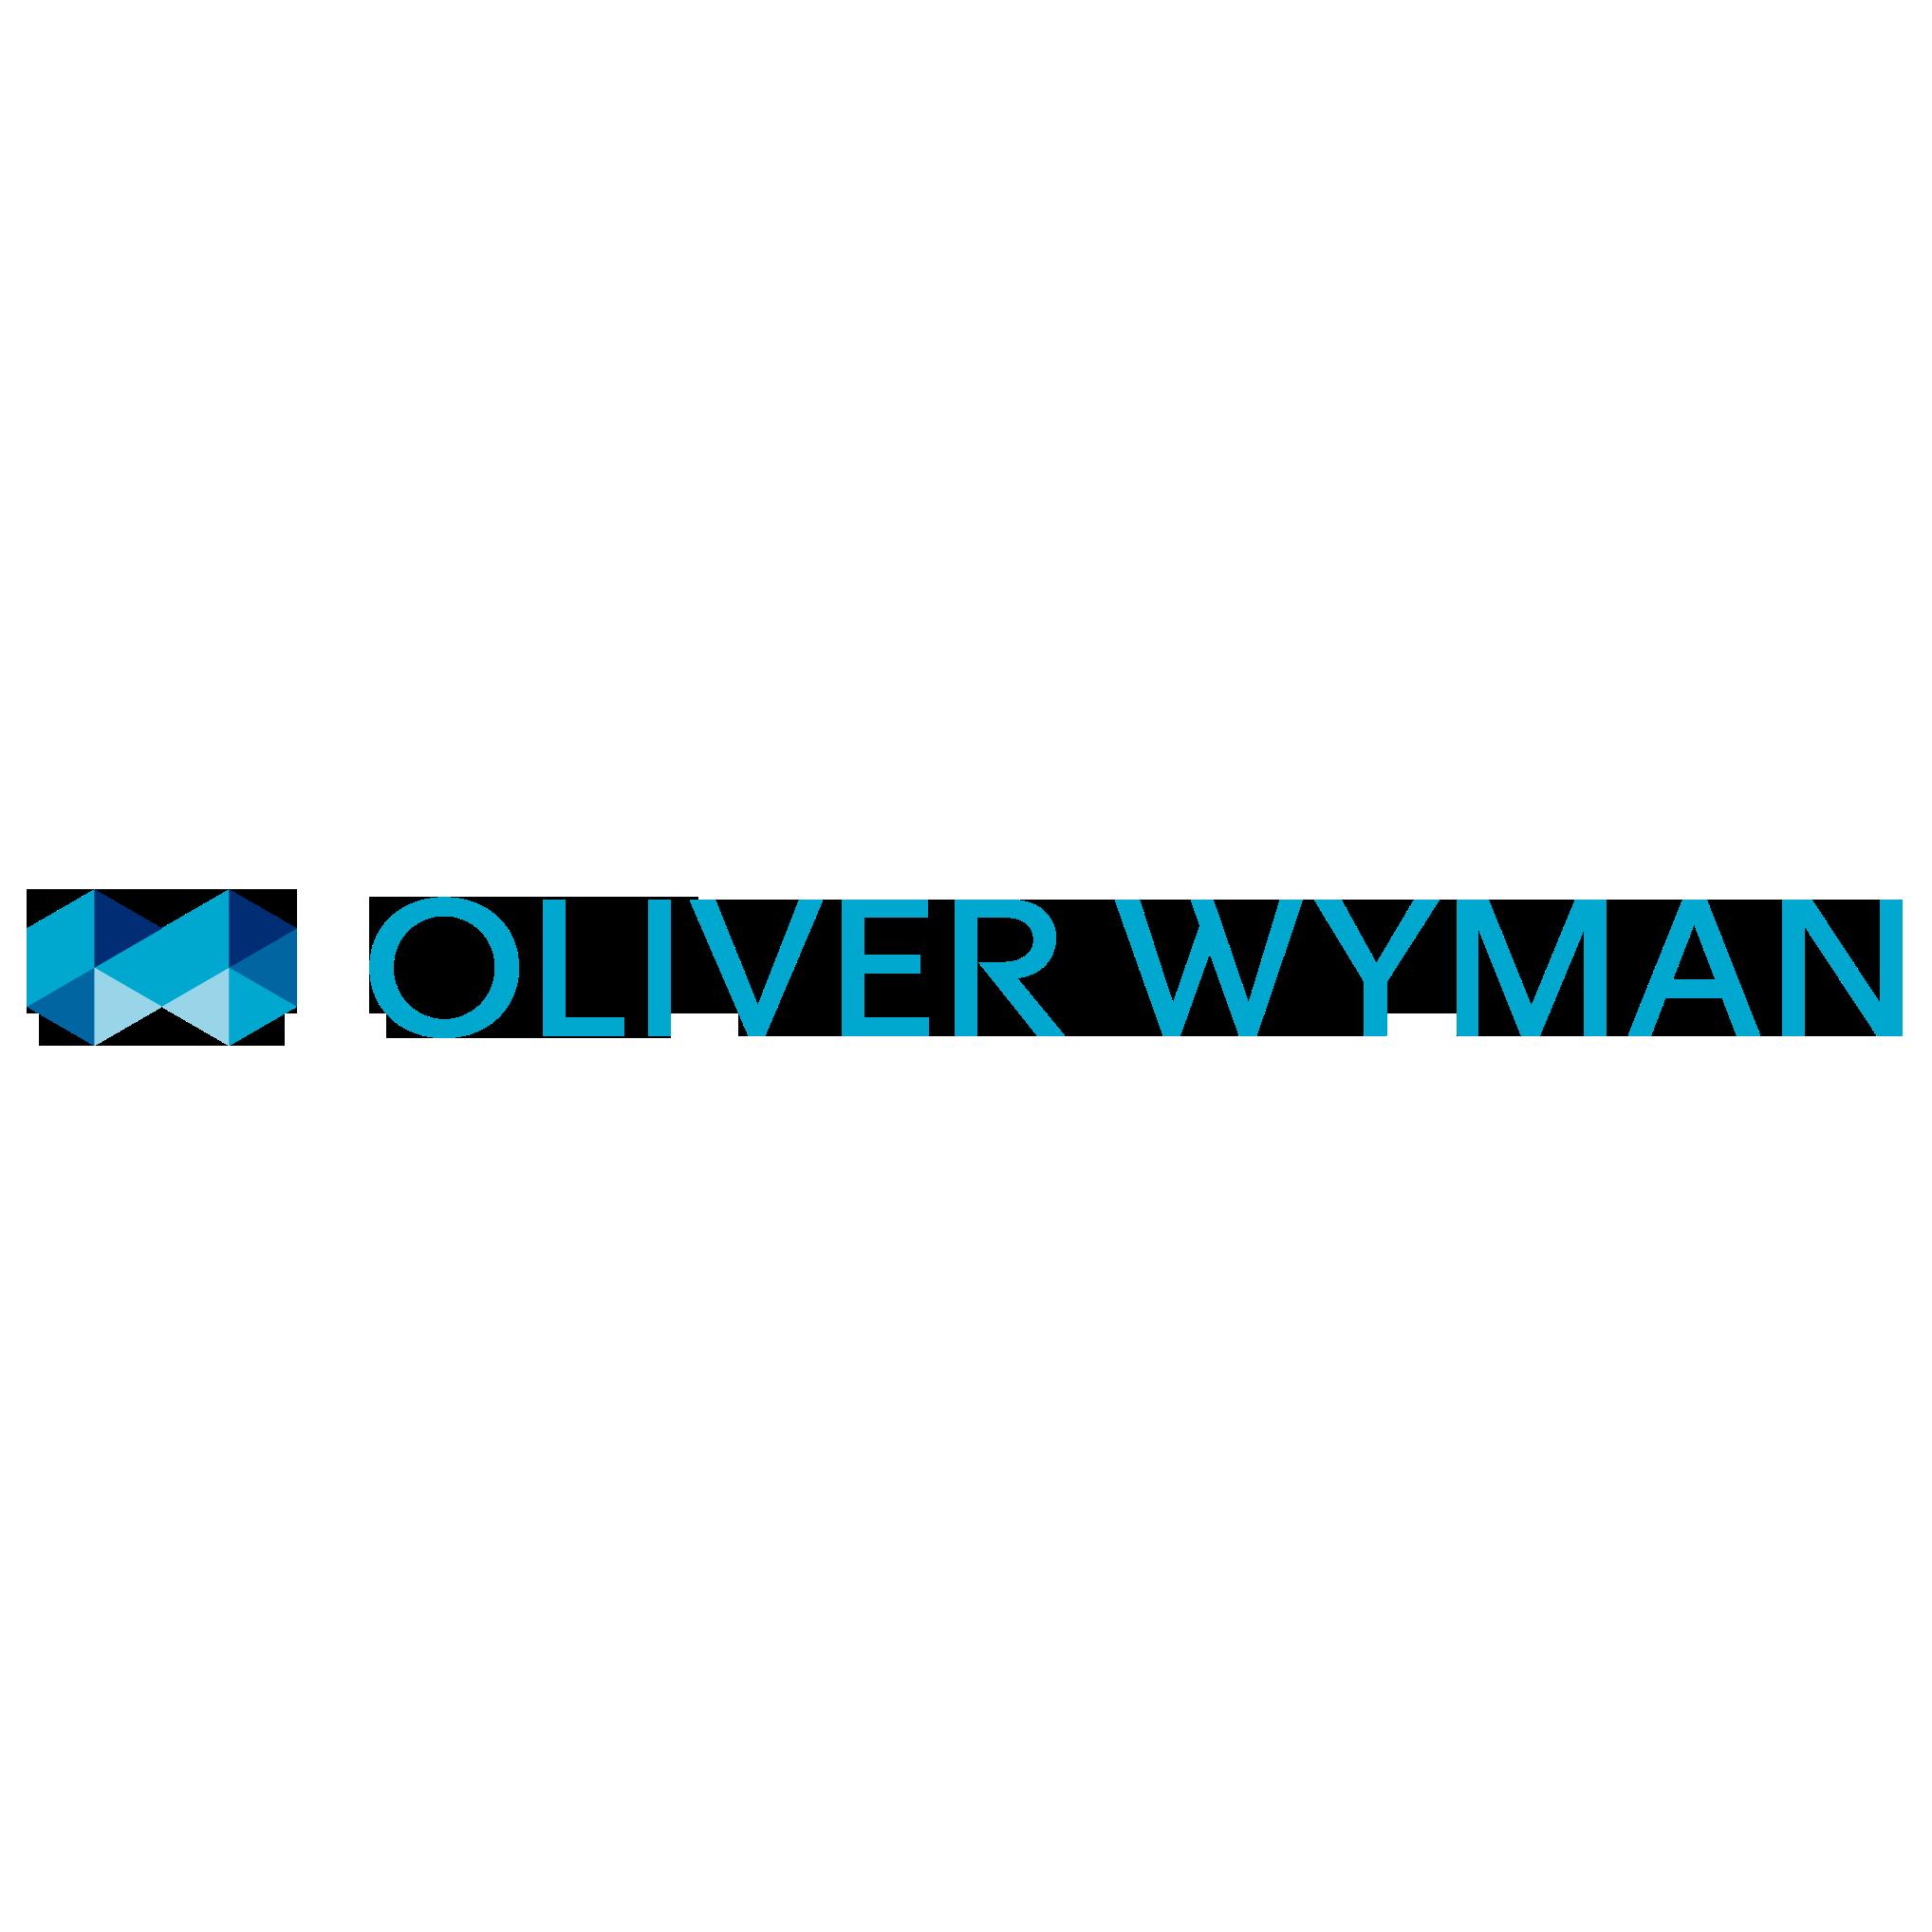 Logo_Oliver-Wyman-Consulting_www.oliverwyman.com_index.html_dian-hasan-branding_NYC-NY-US-2